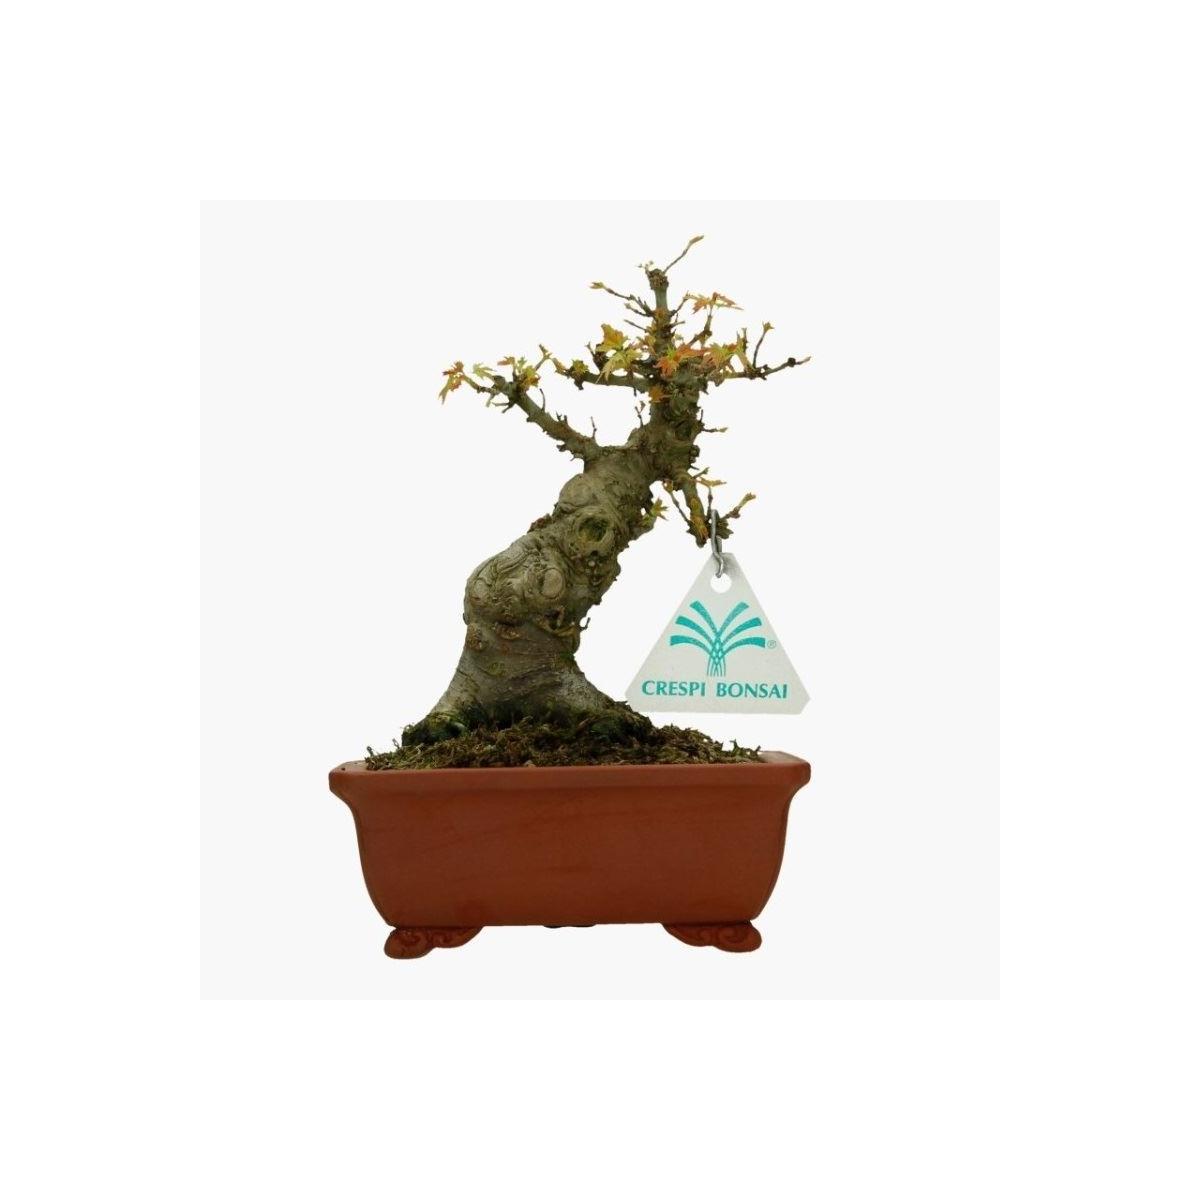 Acero Blu Giapponese acer palmatum kotohime - maple - 19 cm